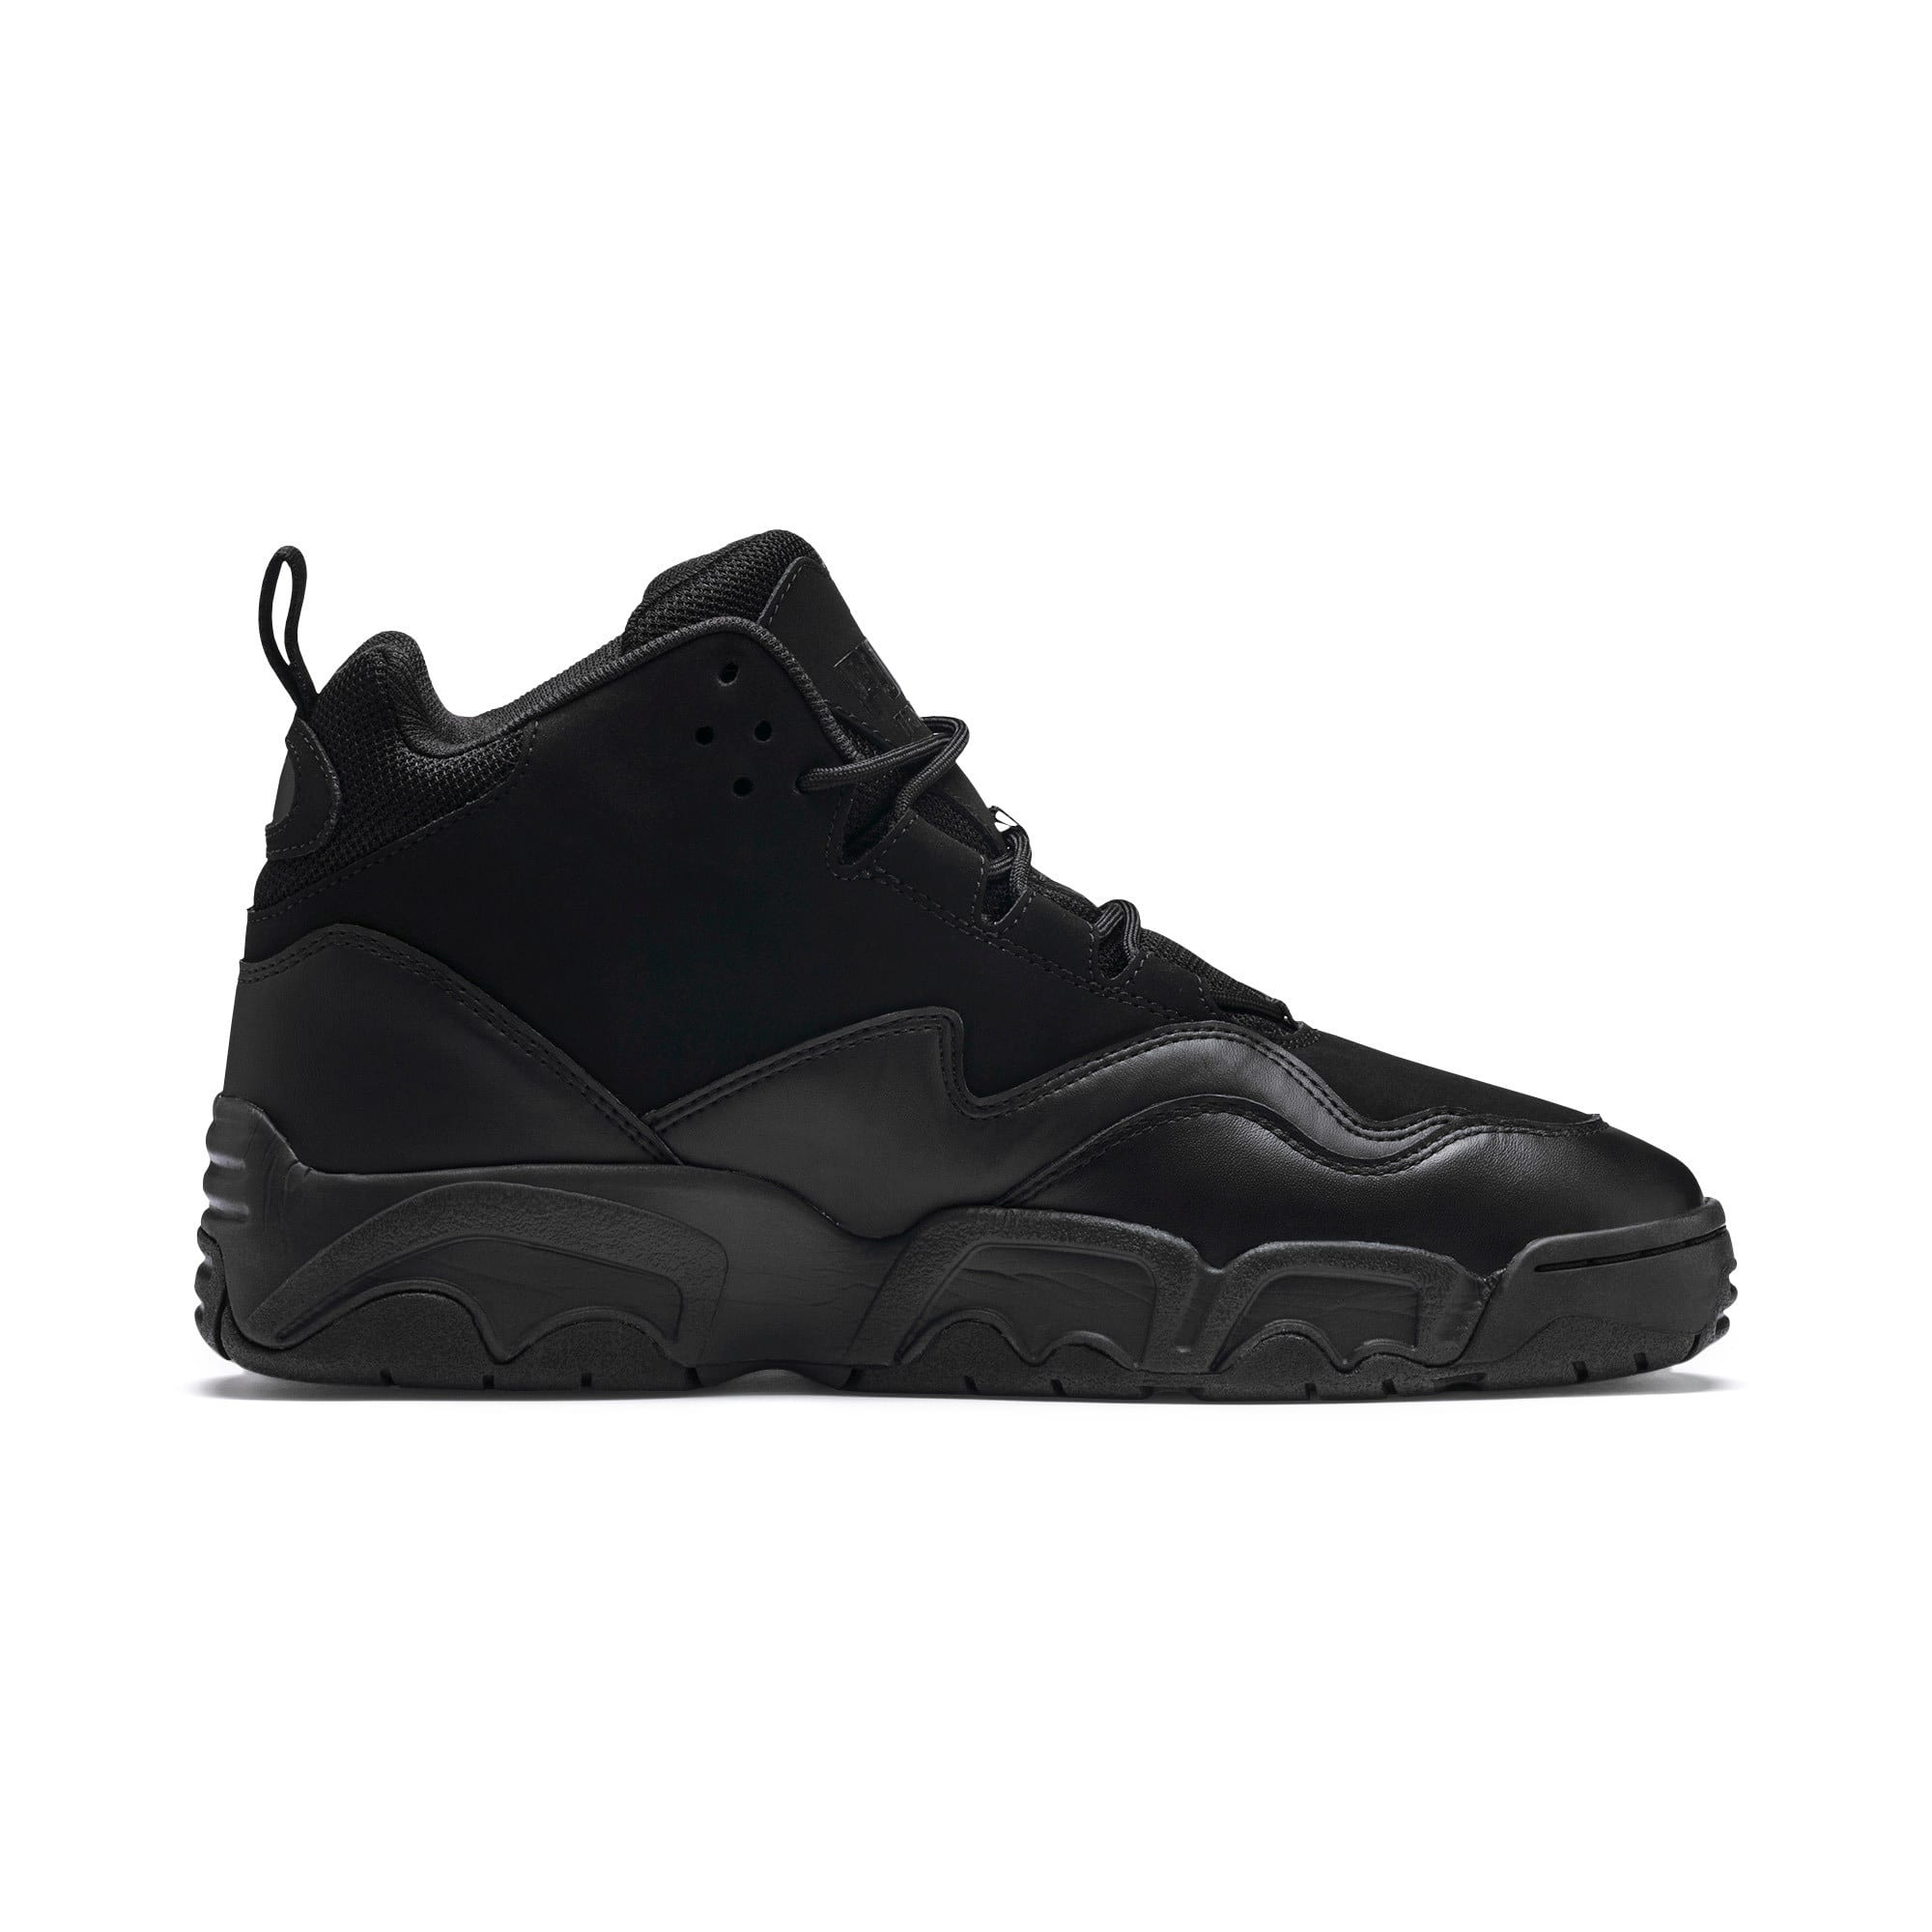 Thumbnail 5 of Source Mid Sneakers, Puma Black, medium